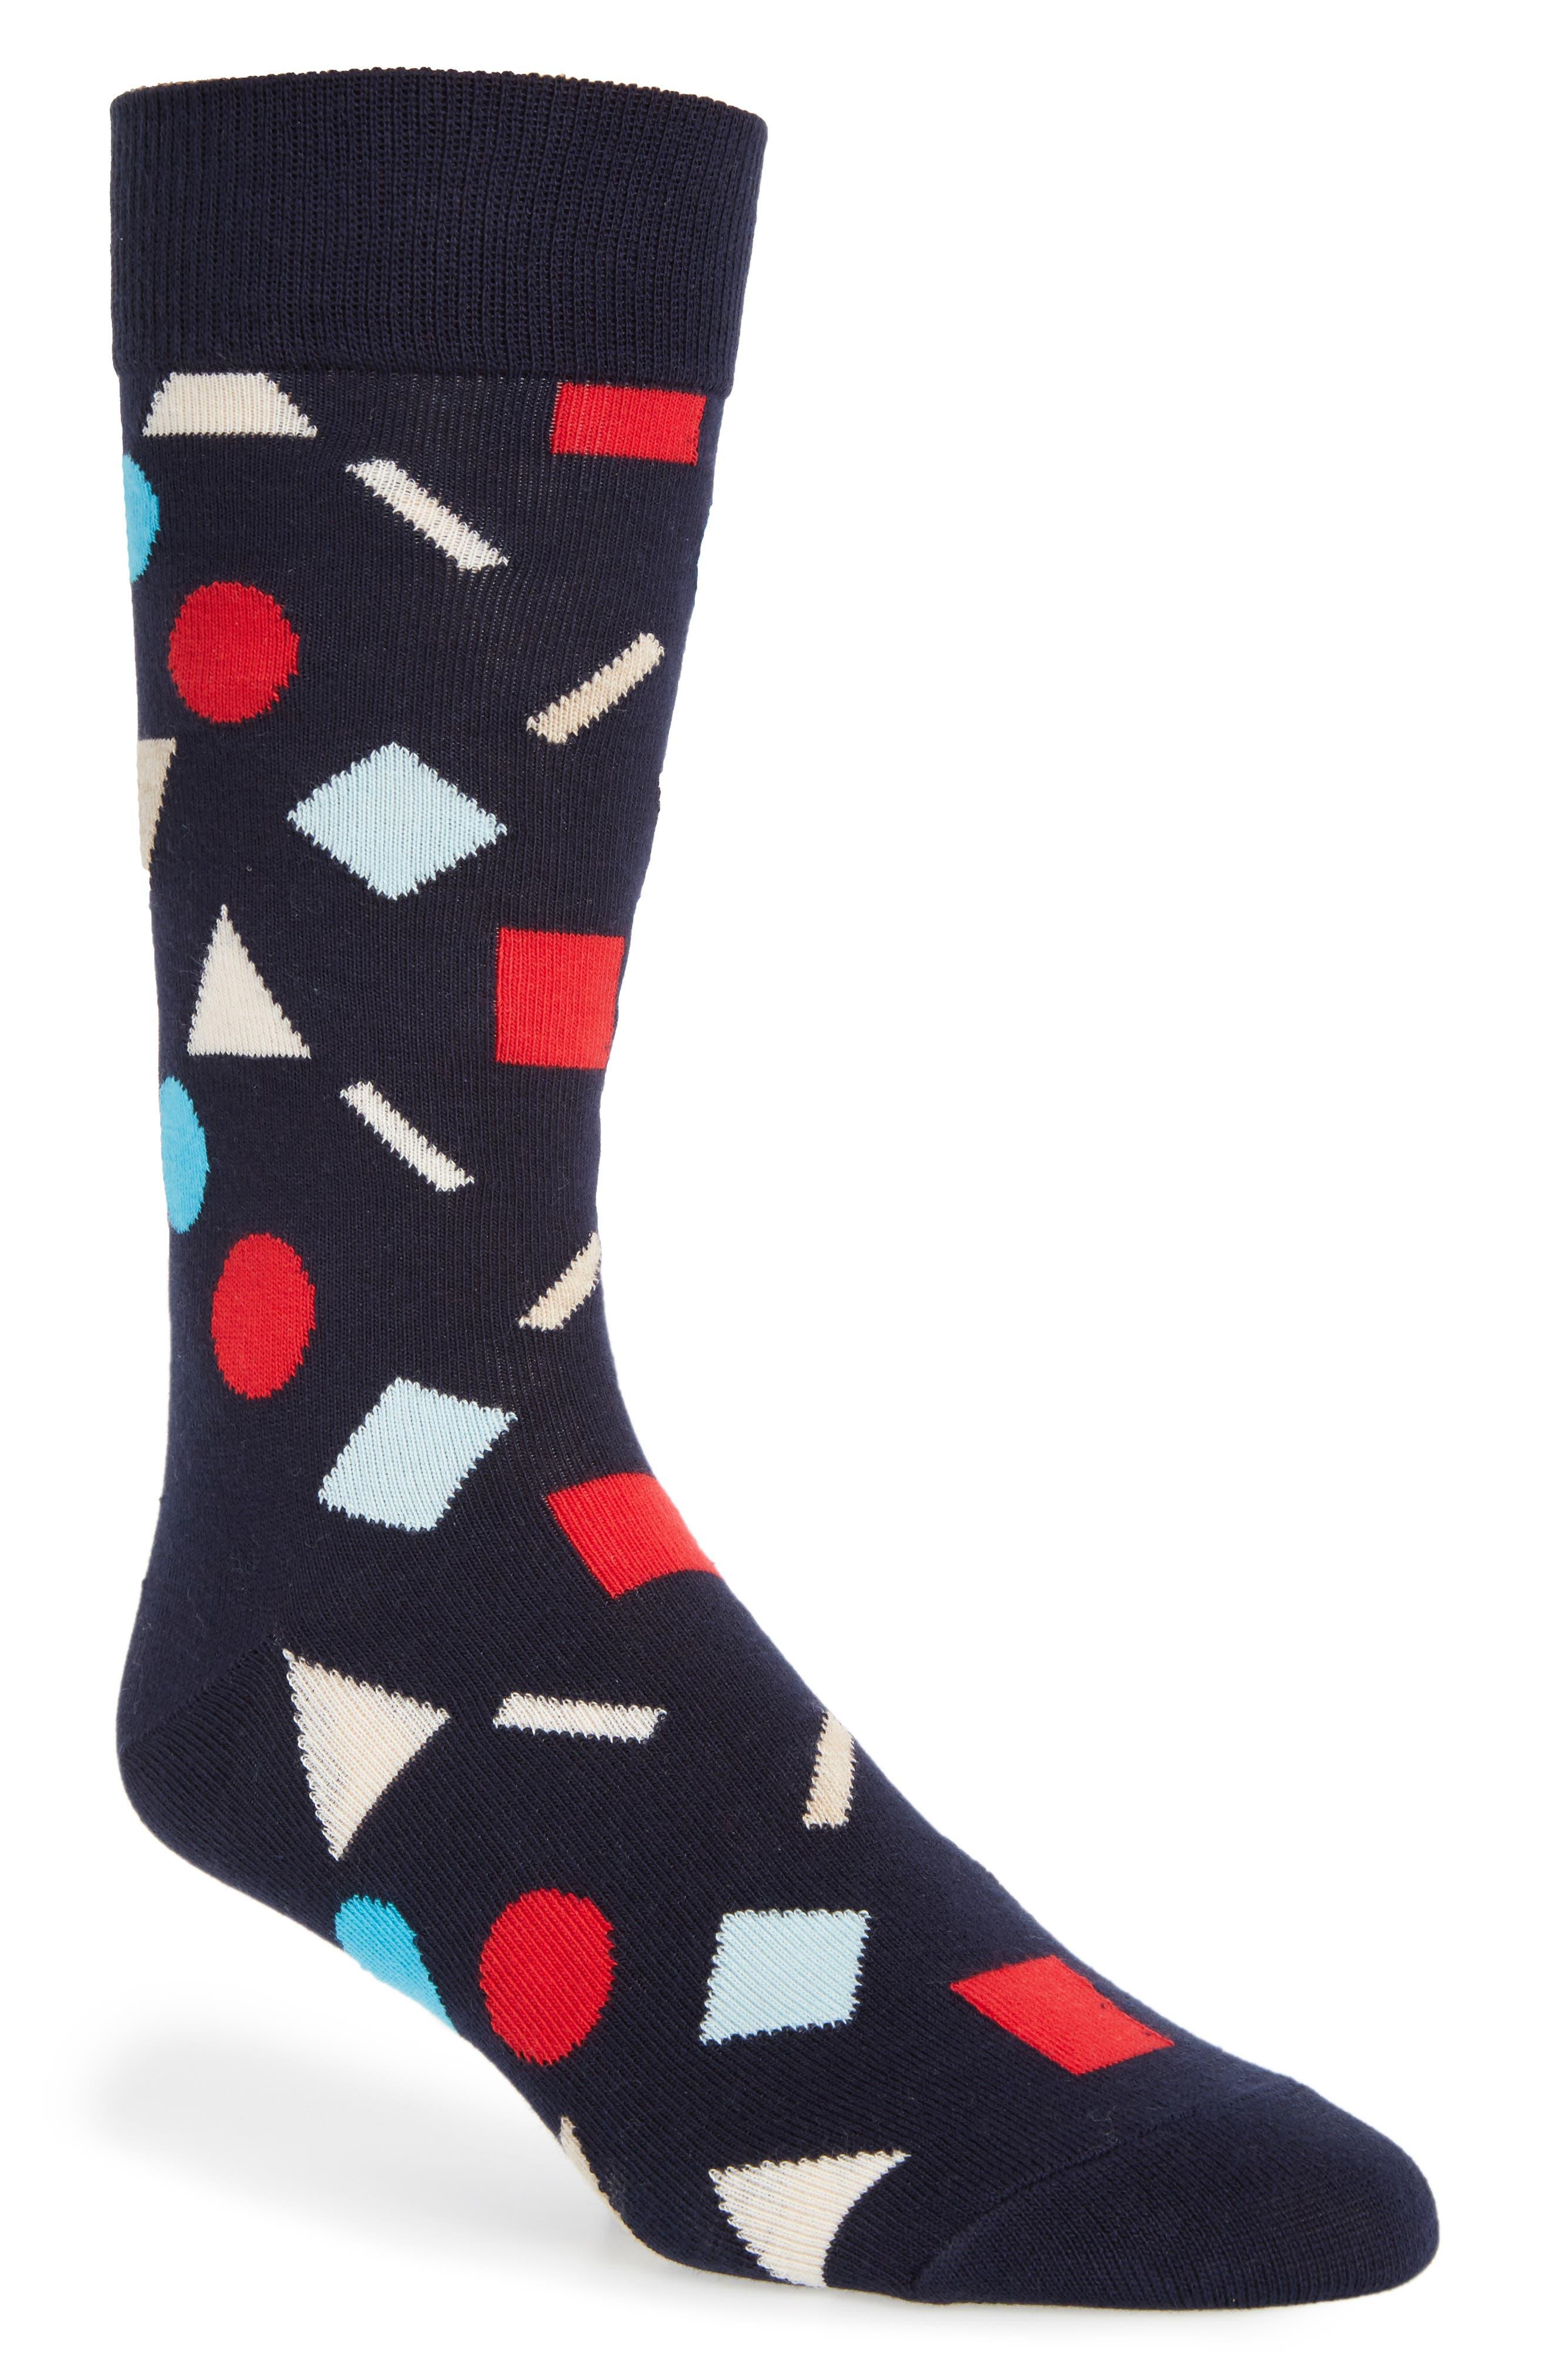 Happy Socks Play Cotton Blend Socks (3 for $30)